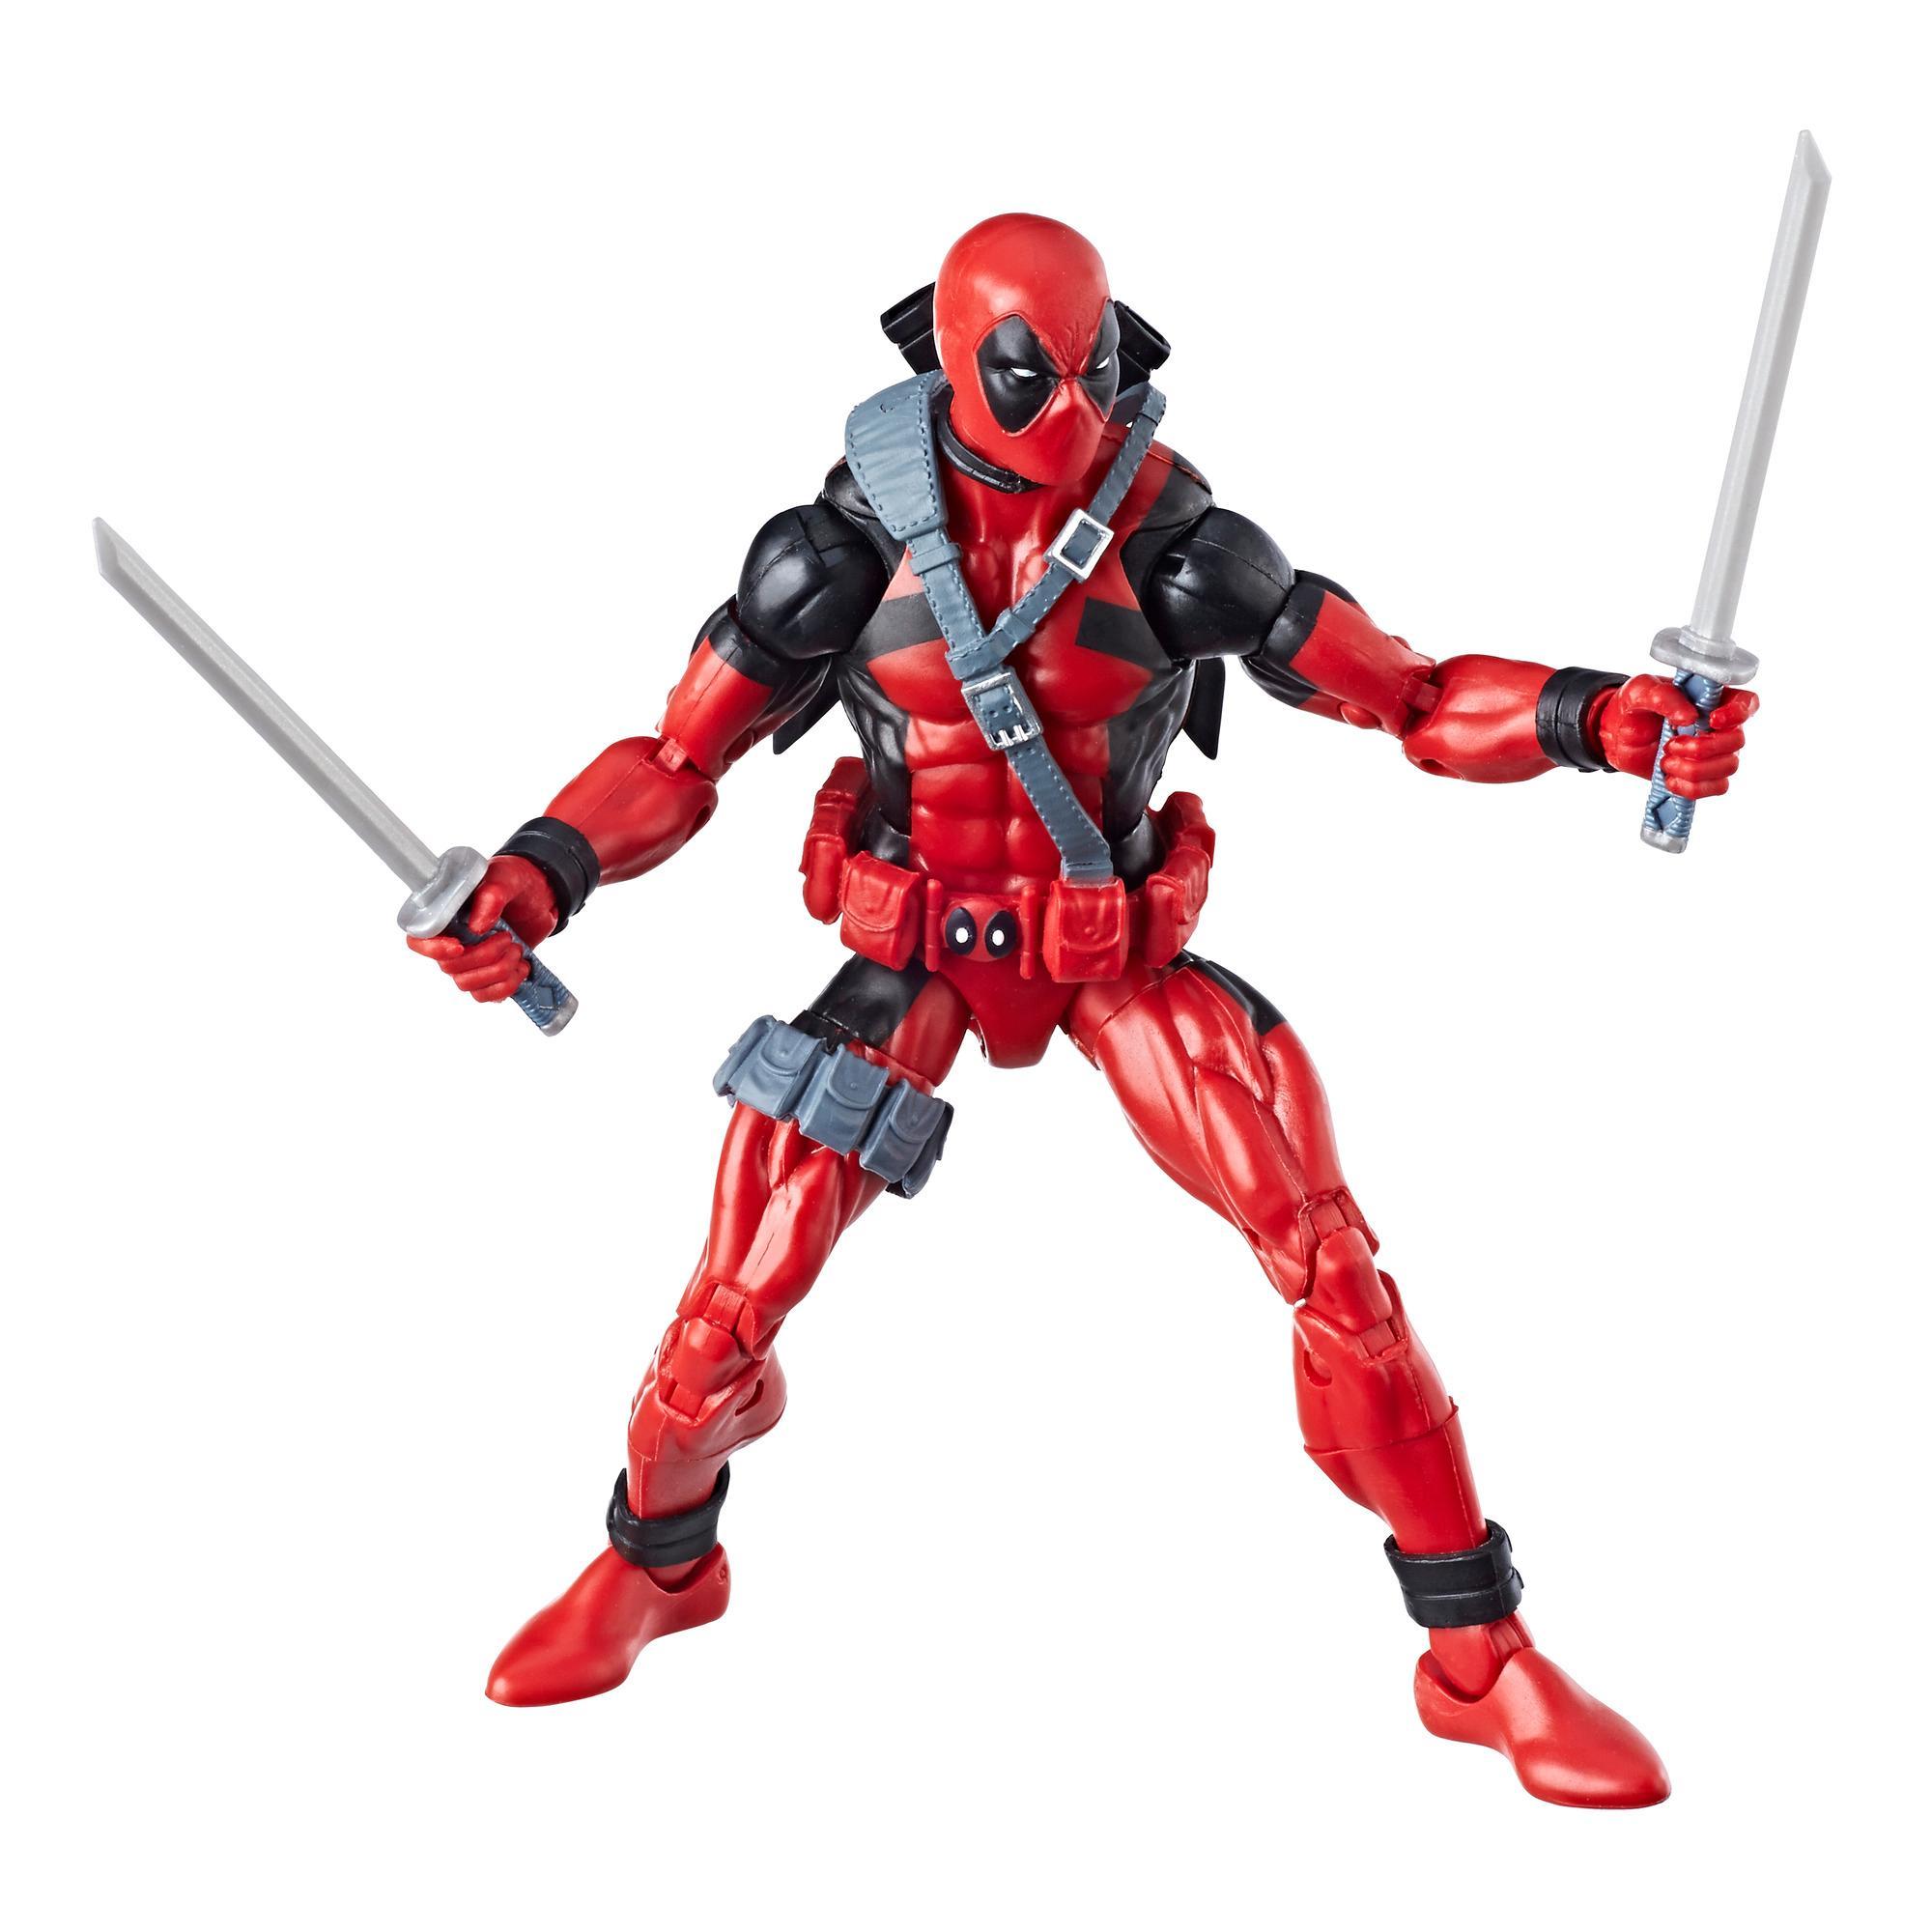 Marvel Legends Series 6-inch Deadpool